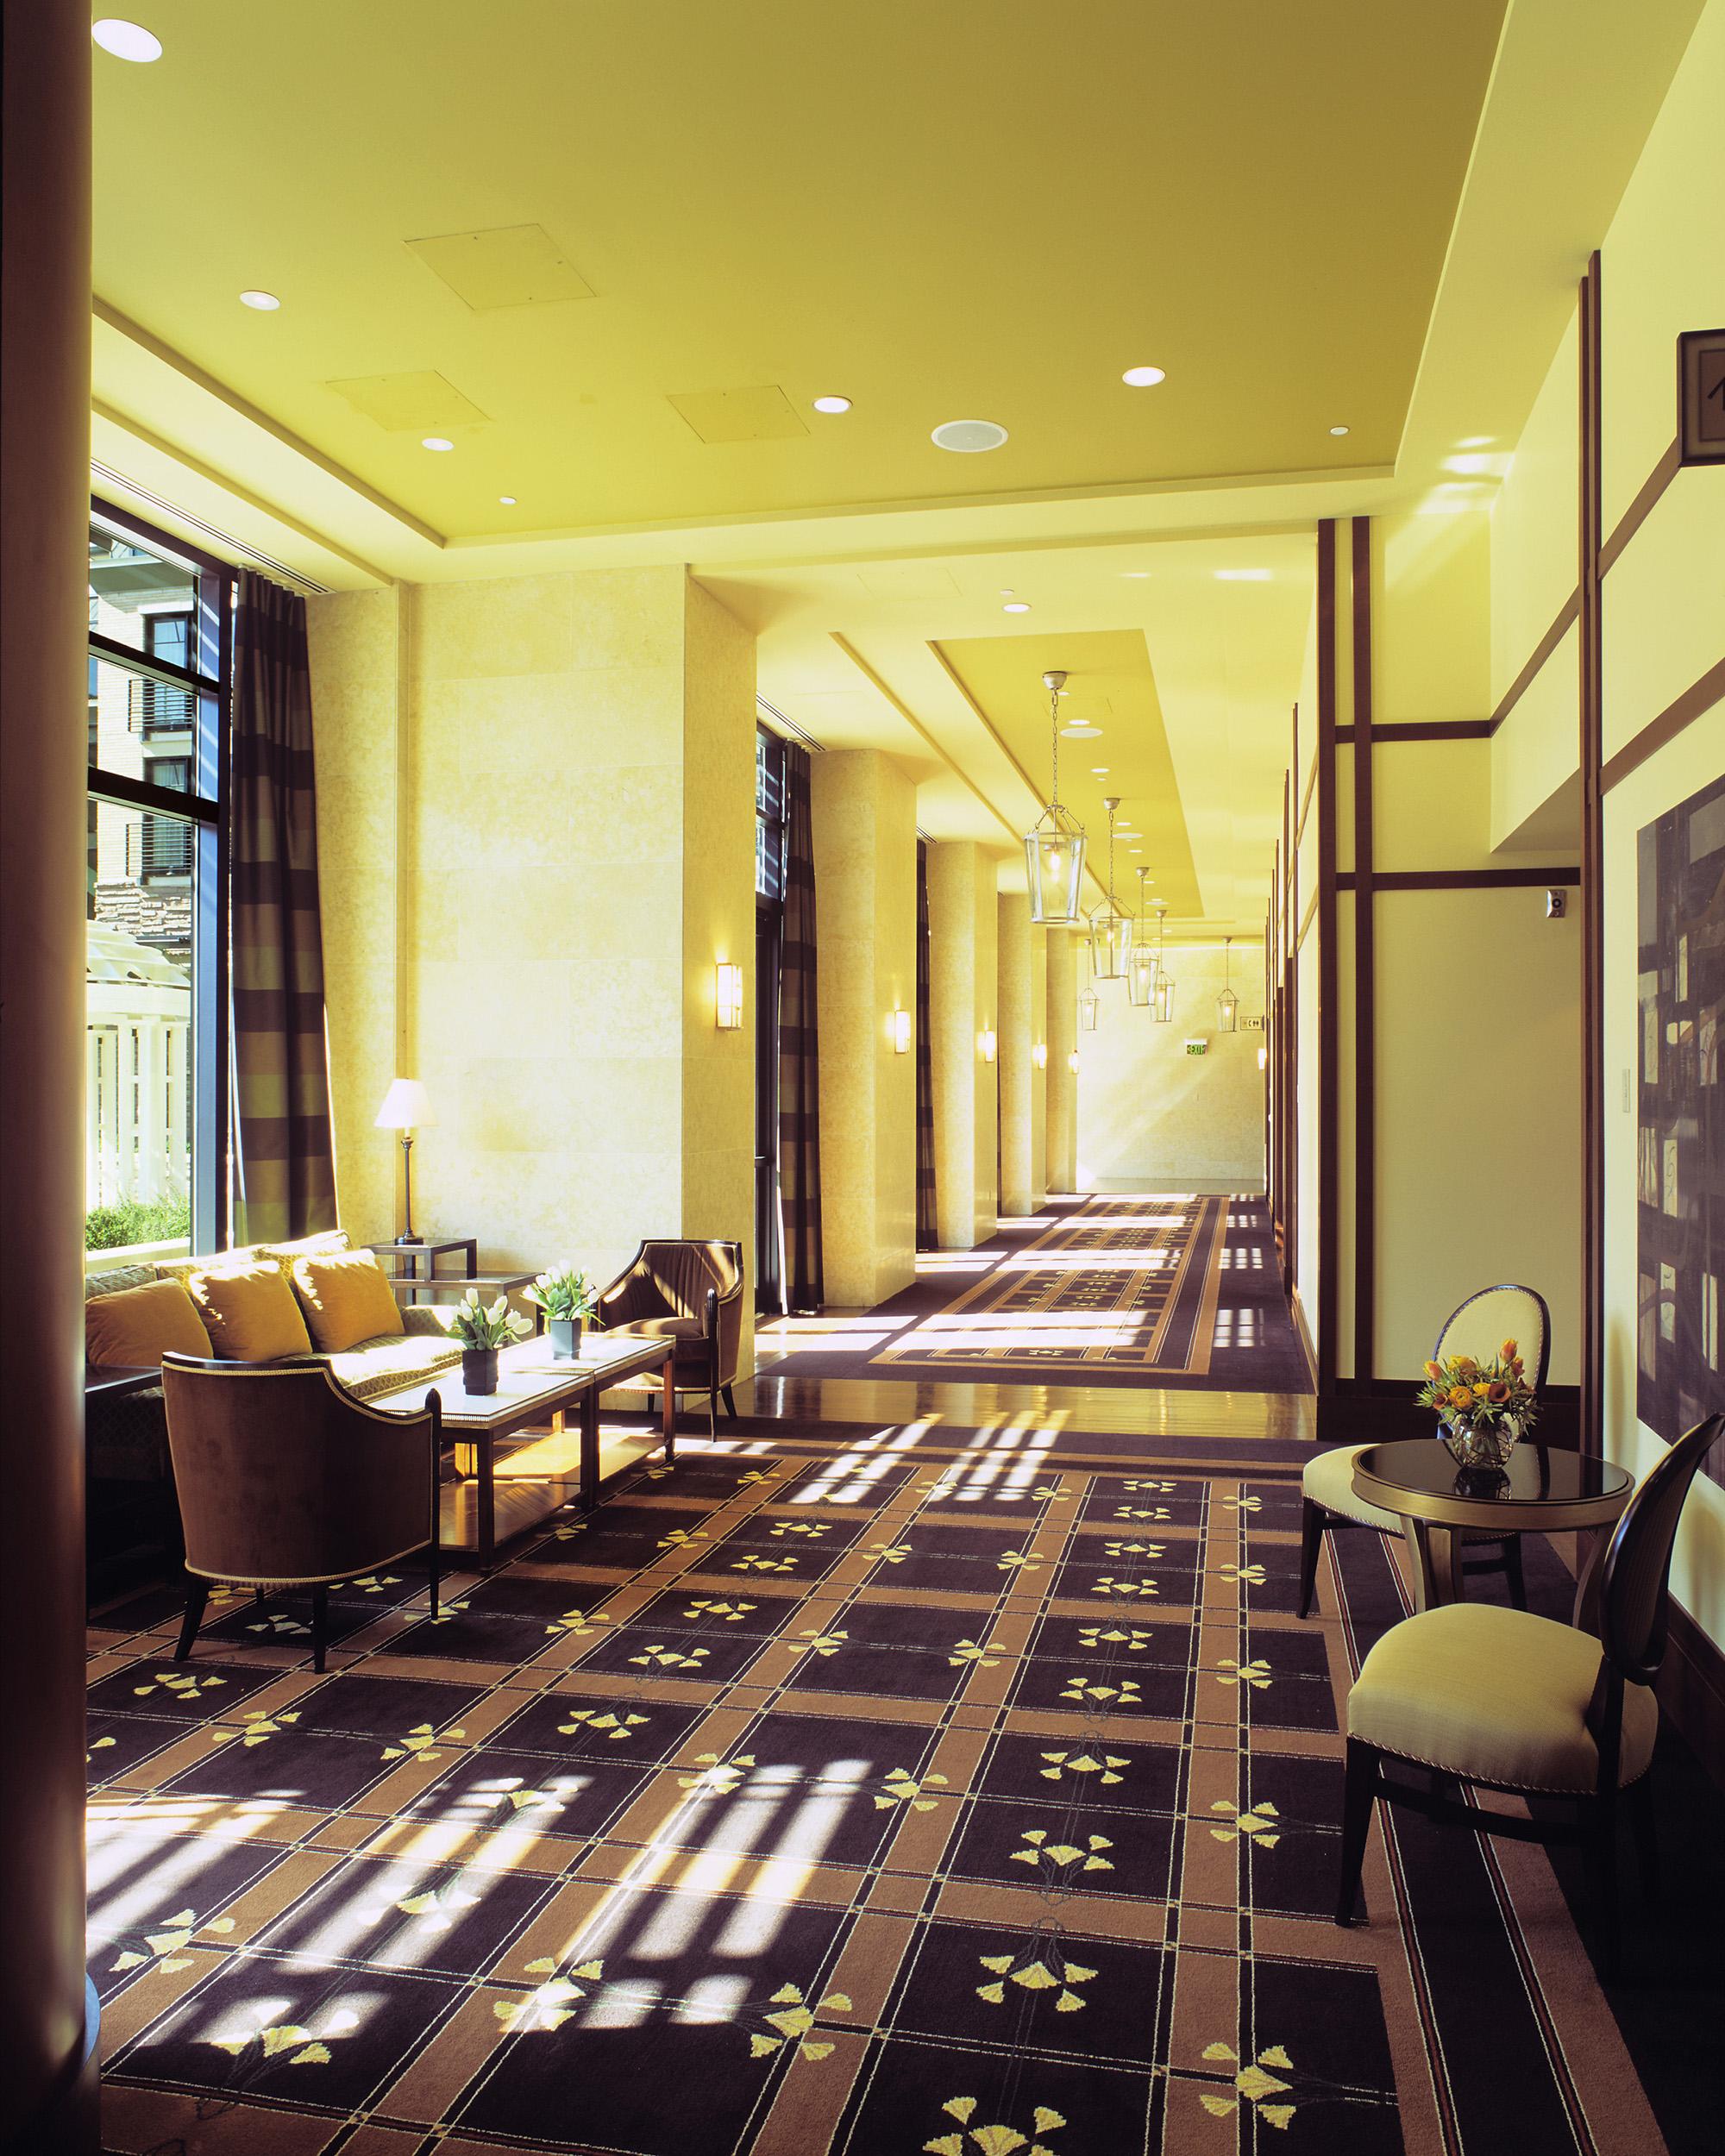 st_julien_hotel_boulder_colorado_hallway_interior.jpg